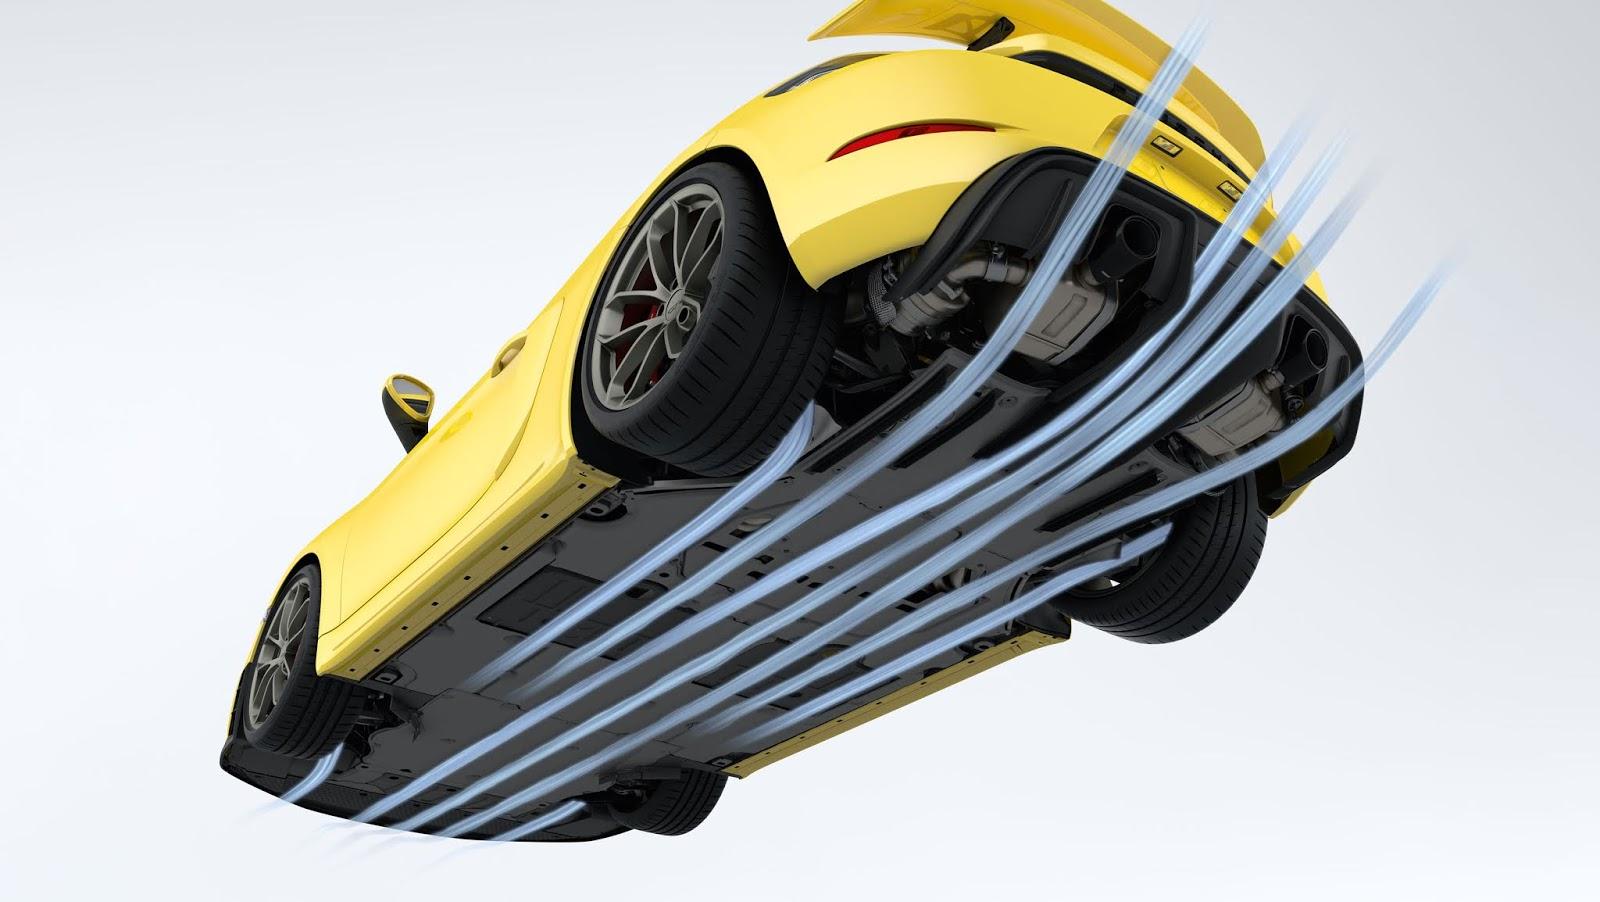 high 718 cayman gt4 2019 porsche ag 1 Δύο εκπληκτικά νέα driver's cars απο τη Porsche Porsche, porsche 718, Porsche 718 Boxster, Porsche 718 Boxster S, porsche 718 cayman, porsche 718 cayman gt4, porsche cayman, porsche cayman s, porsche gt4, Sports, sportscar, zblog